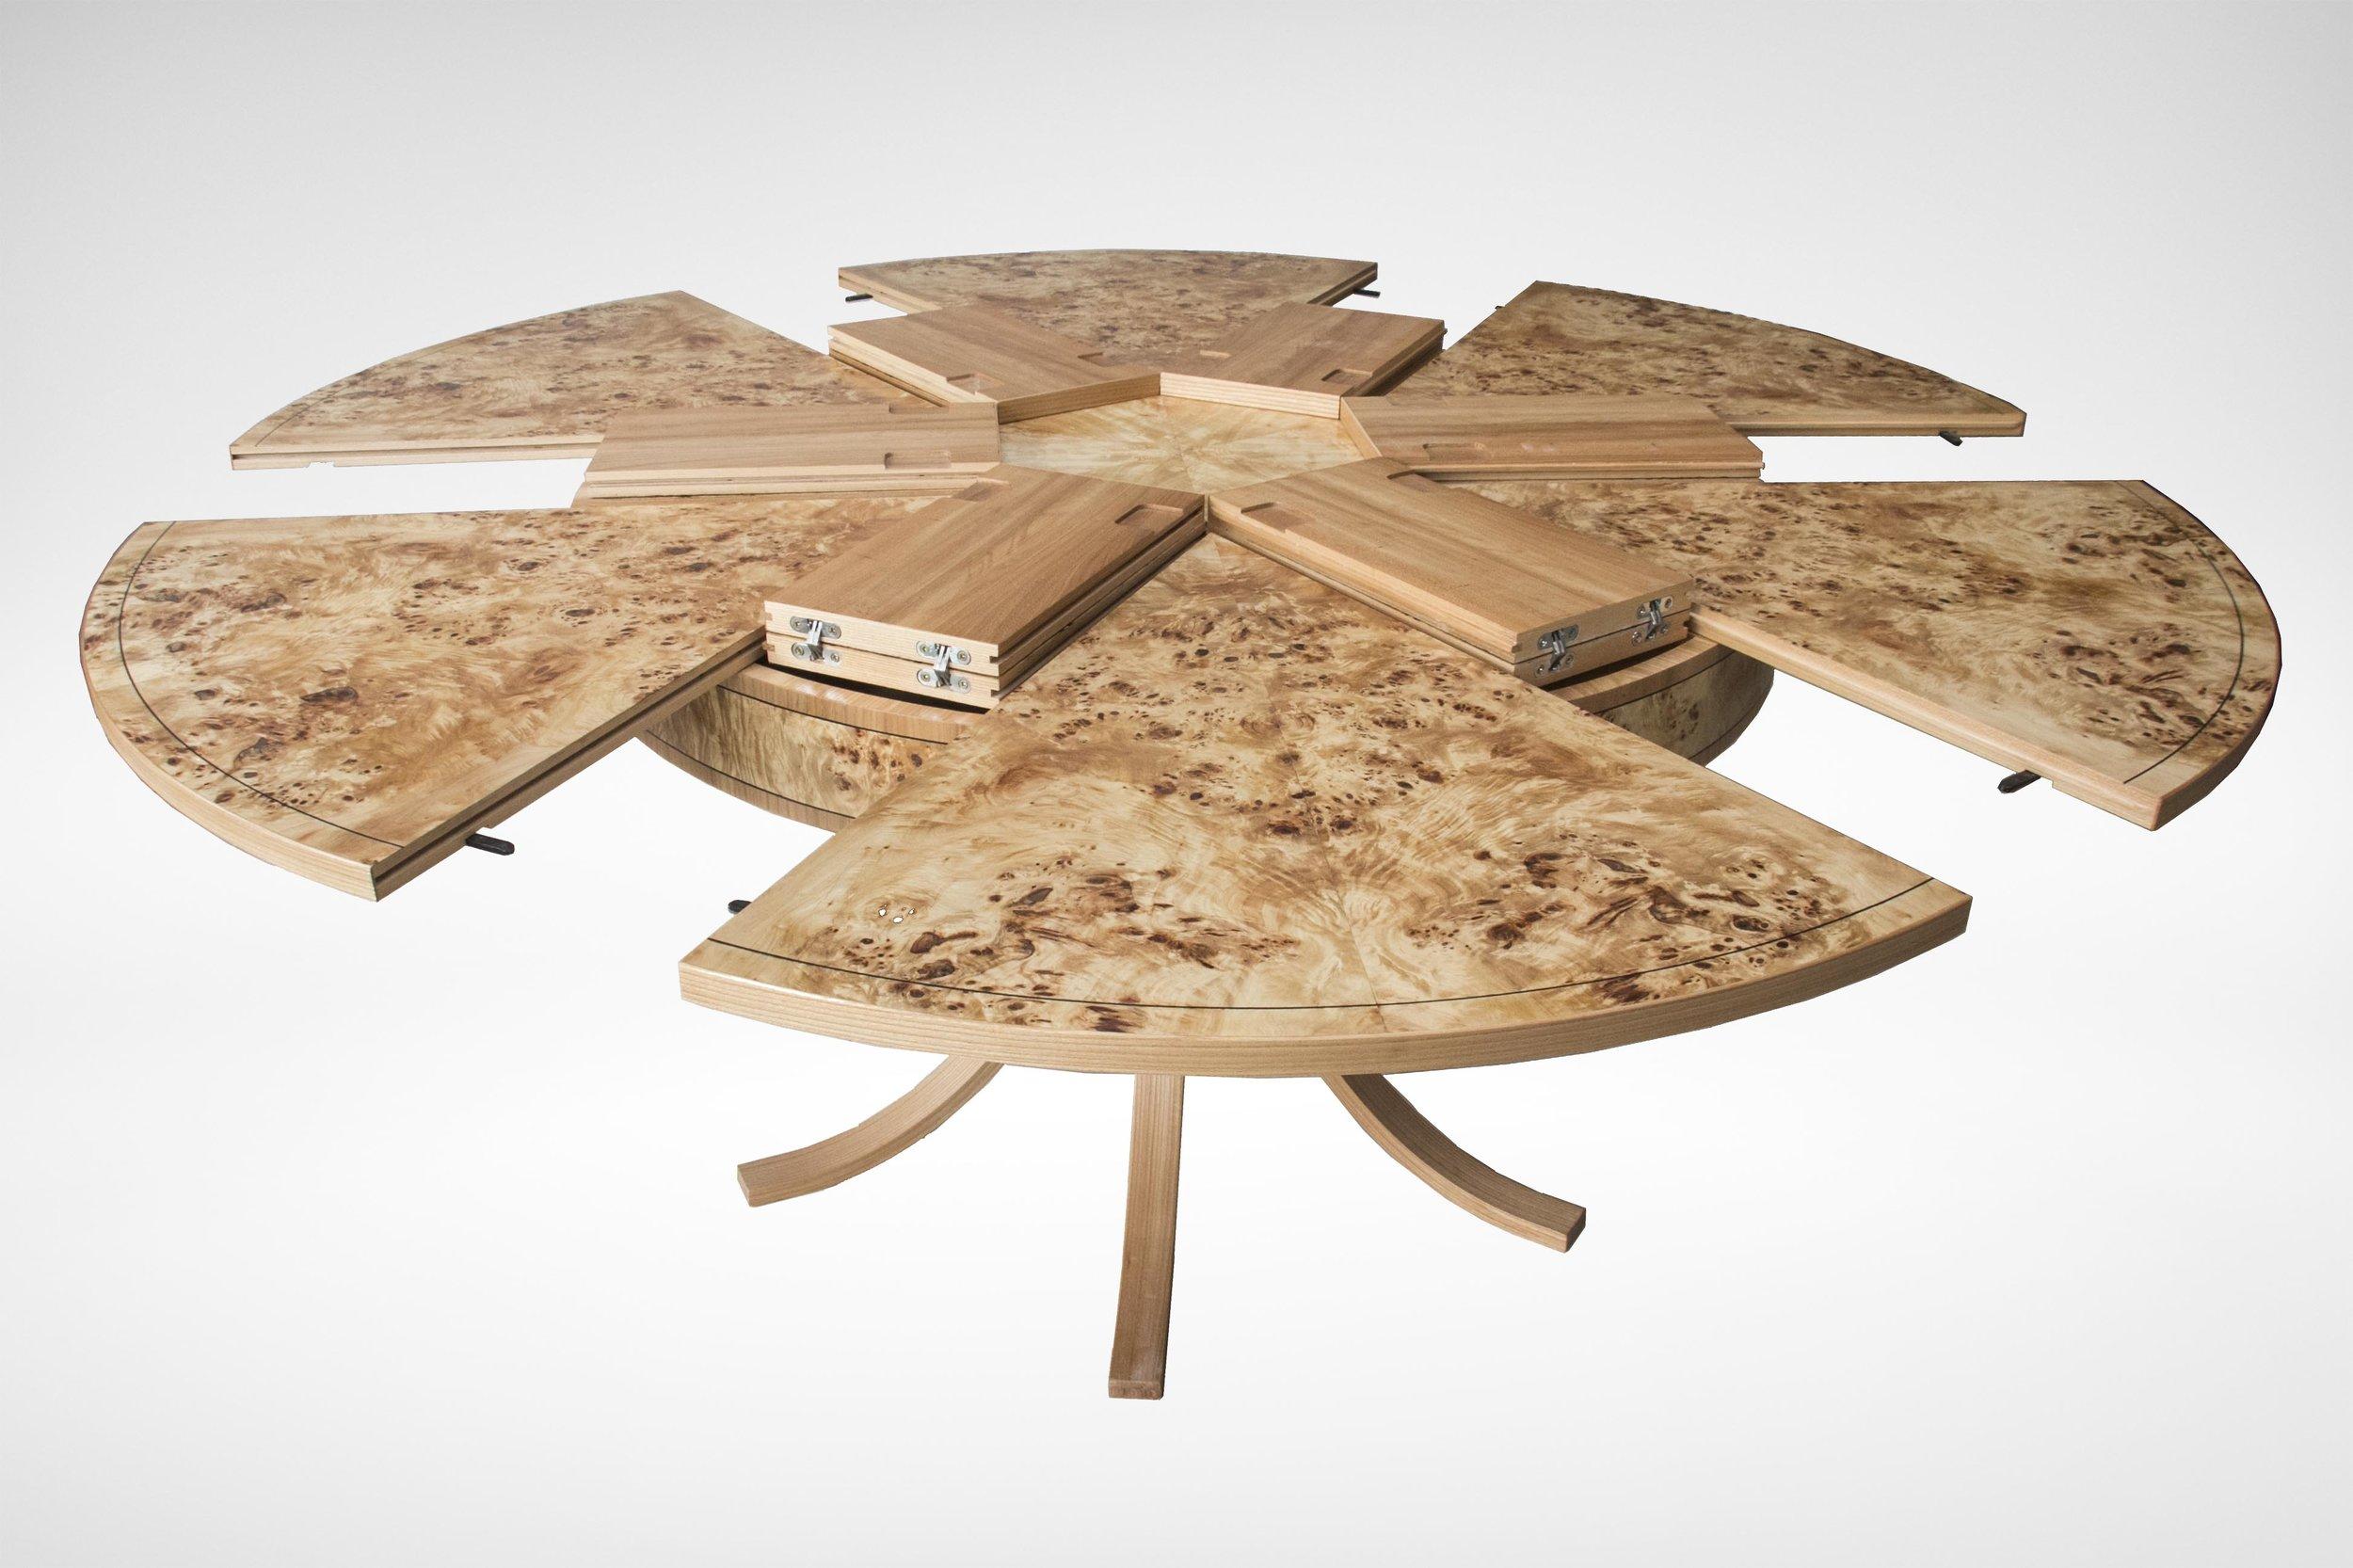 Johnson Furniture - Burr poplar and elm dining table 03.jpg